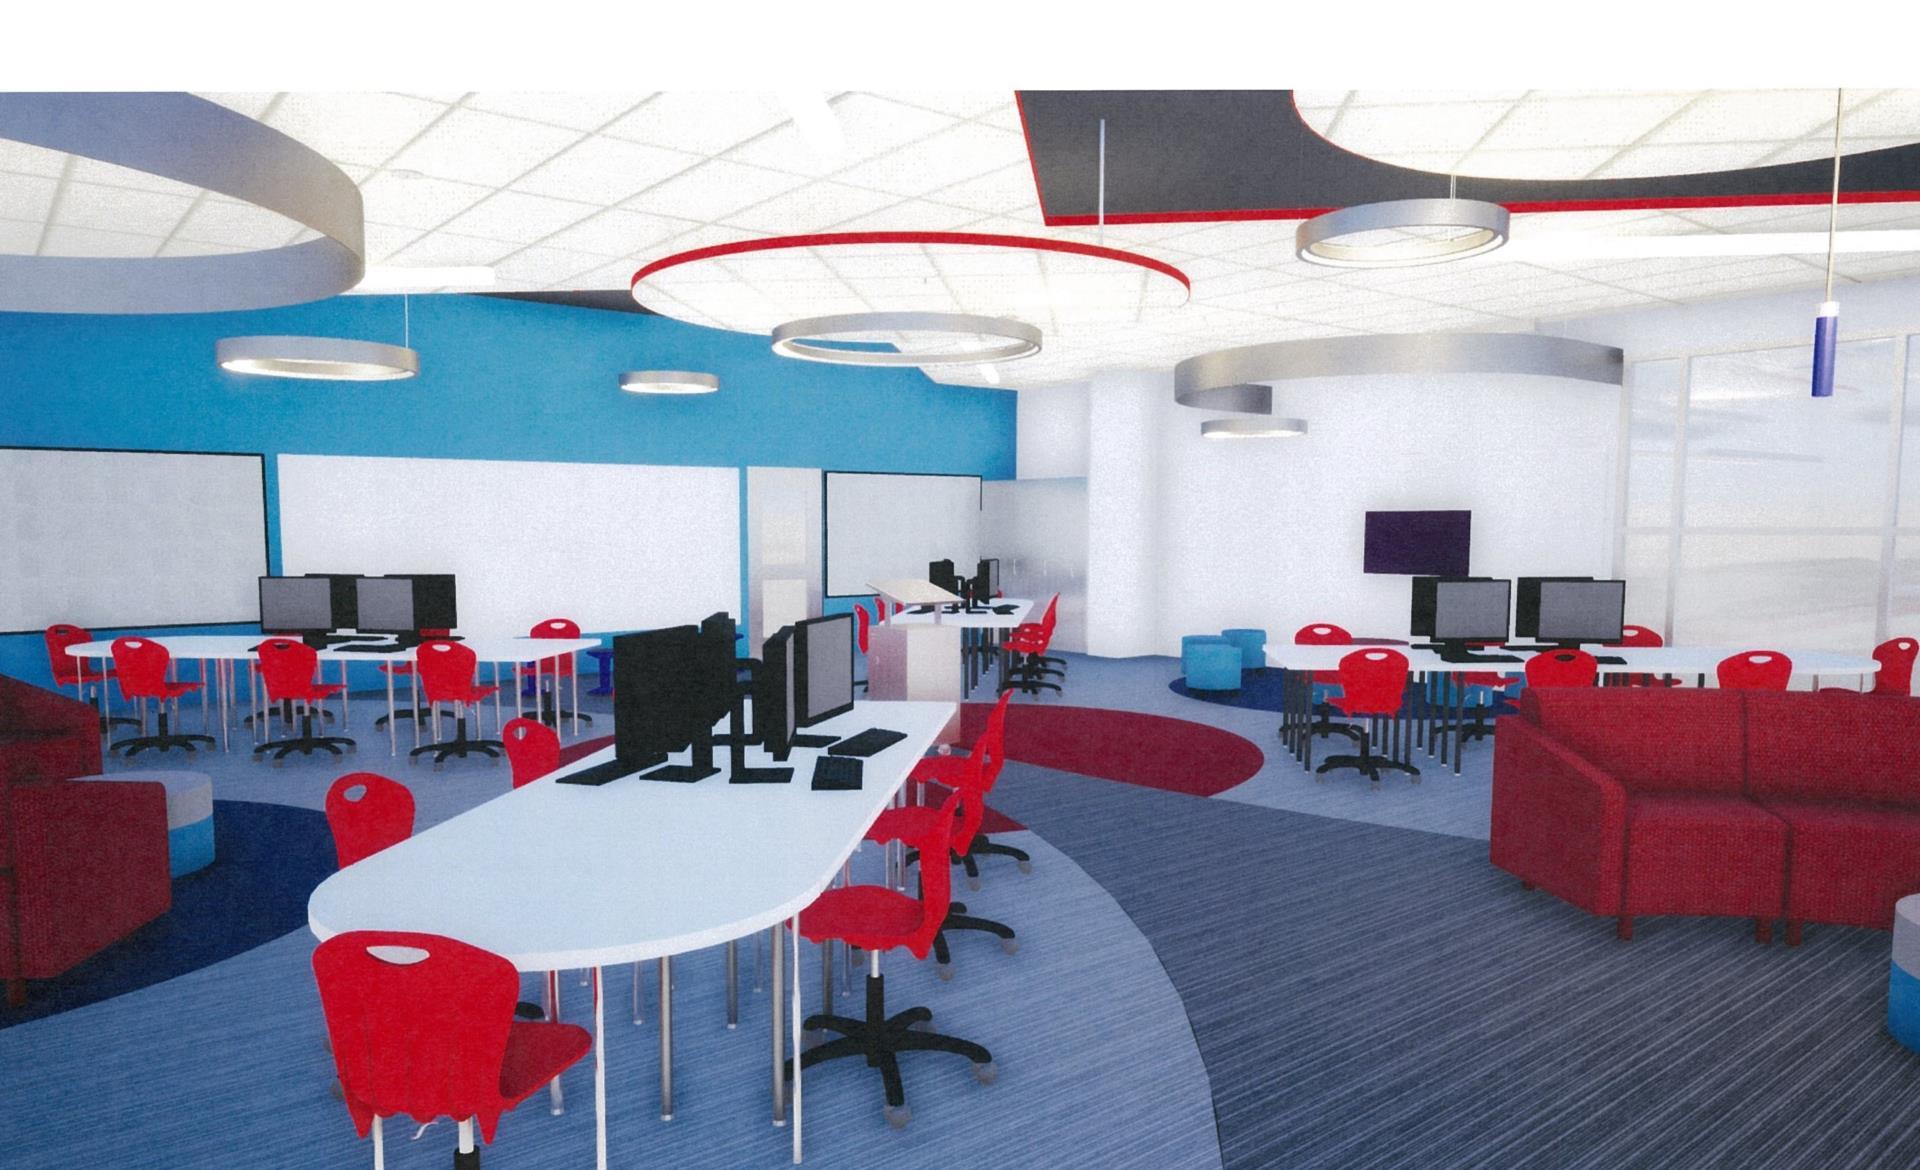 Lab interior view 1